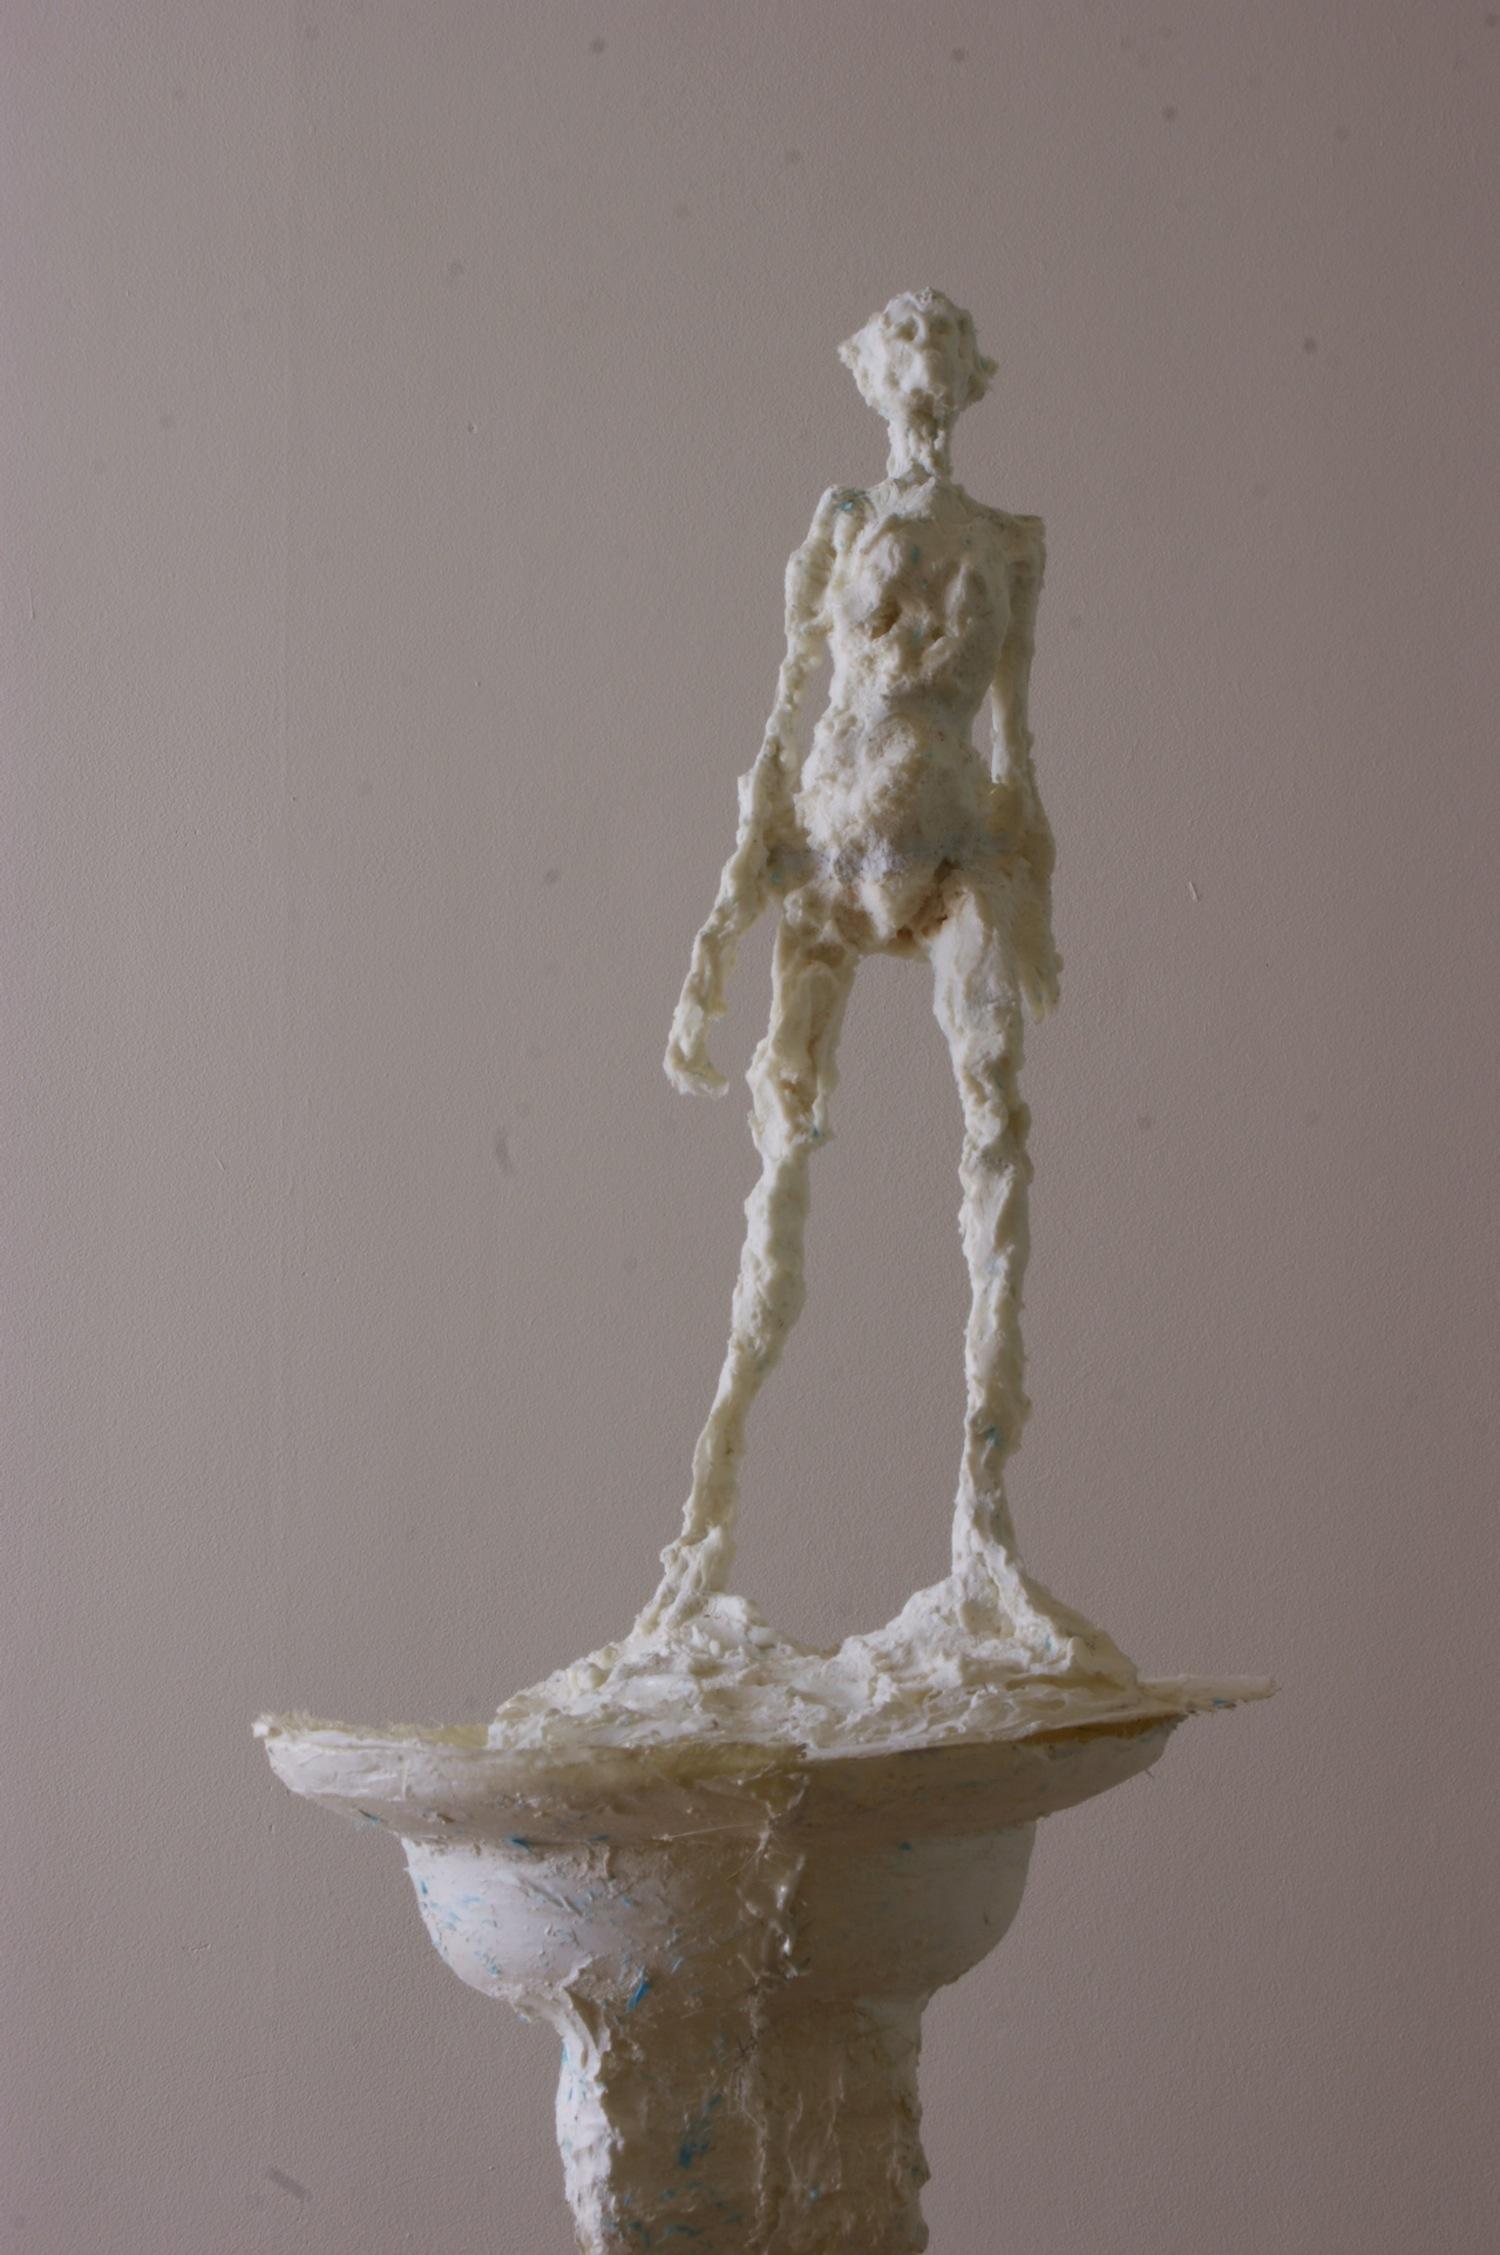 Standard 2 (2011) (detail) Cast polyurethane, fiberglass, plaster